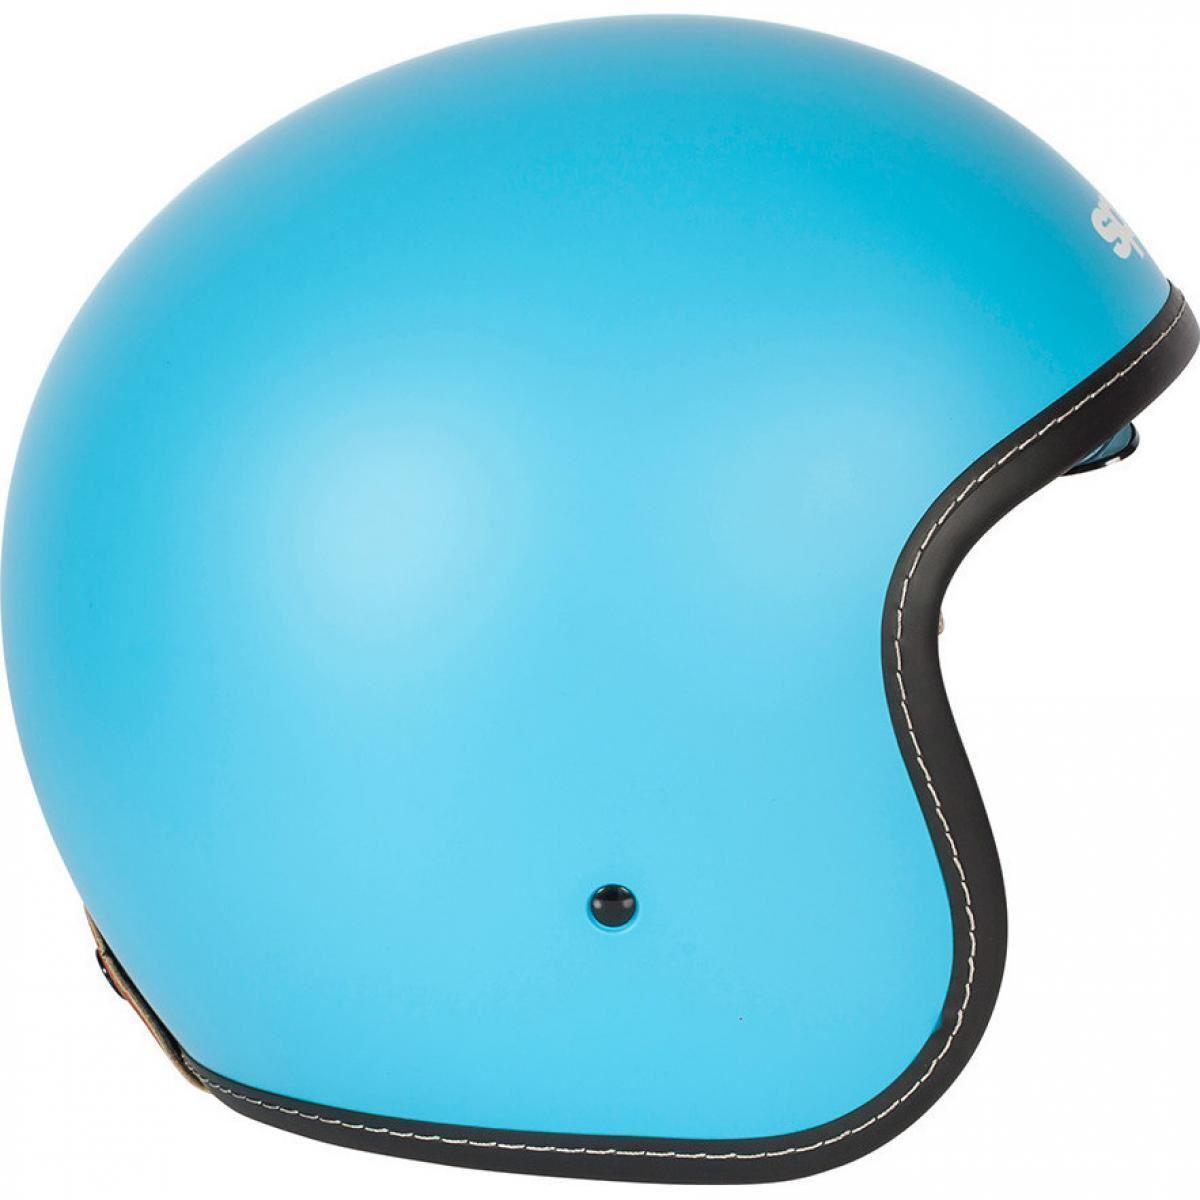 Spada-Raze-Ouvert-Casque-Bleu-Integre-Visiere miniature 23